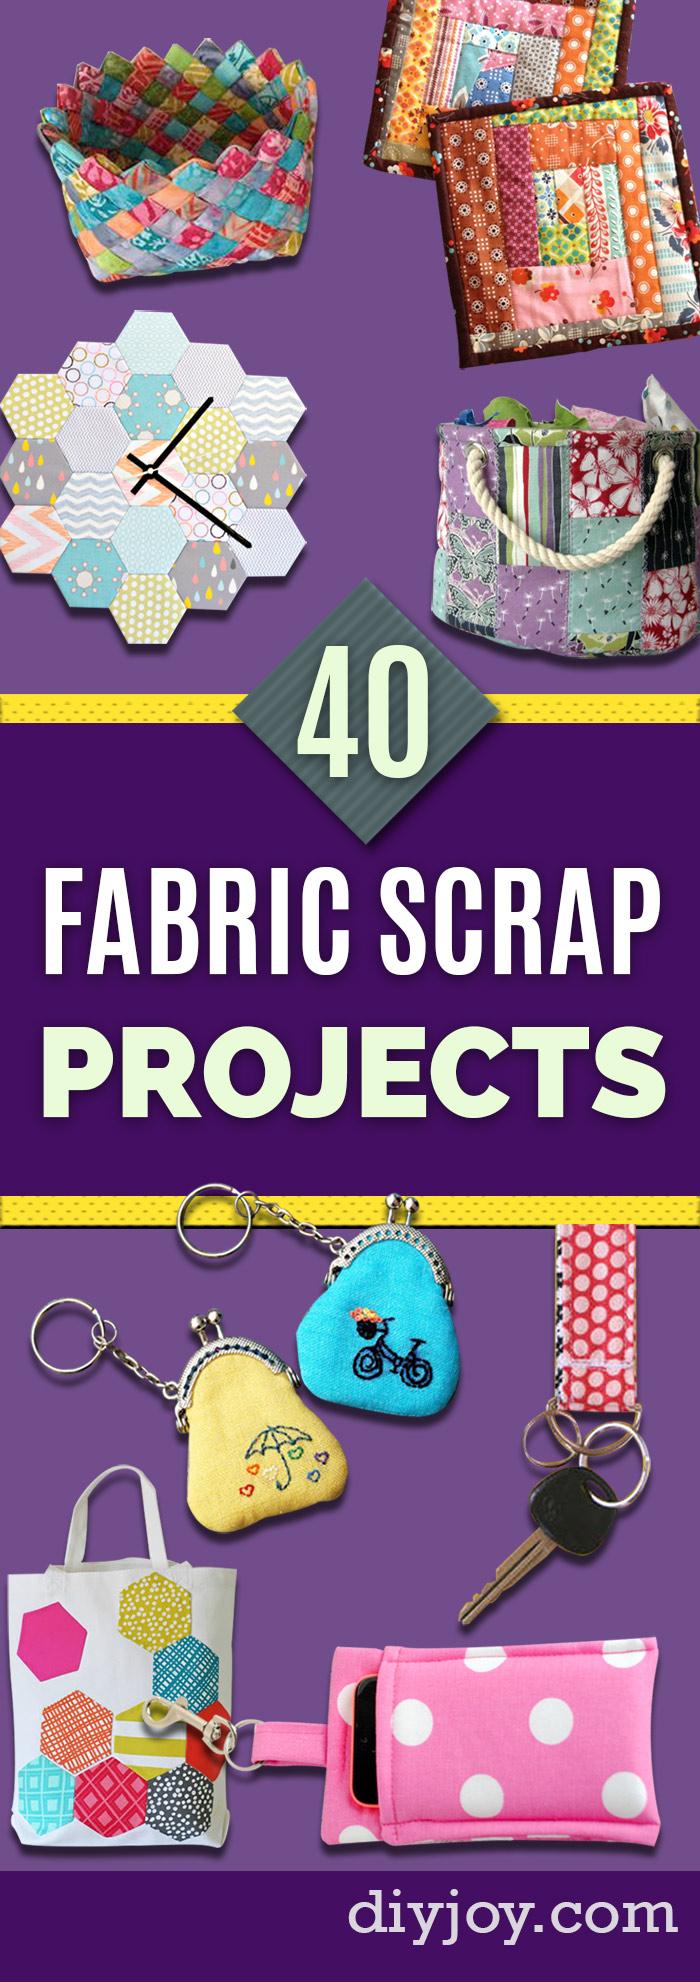 Fabric Scraps Pin - DIY Ideas for Leftover Fabric Scraps - Crafts Using Small Pieces of Fabrics